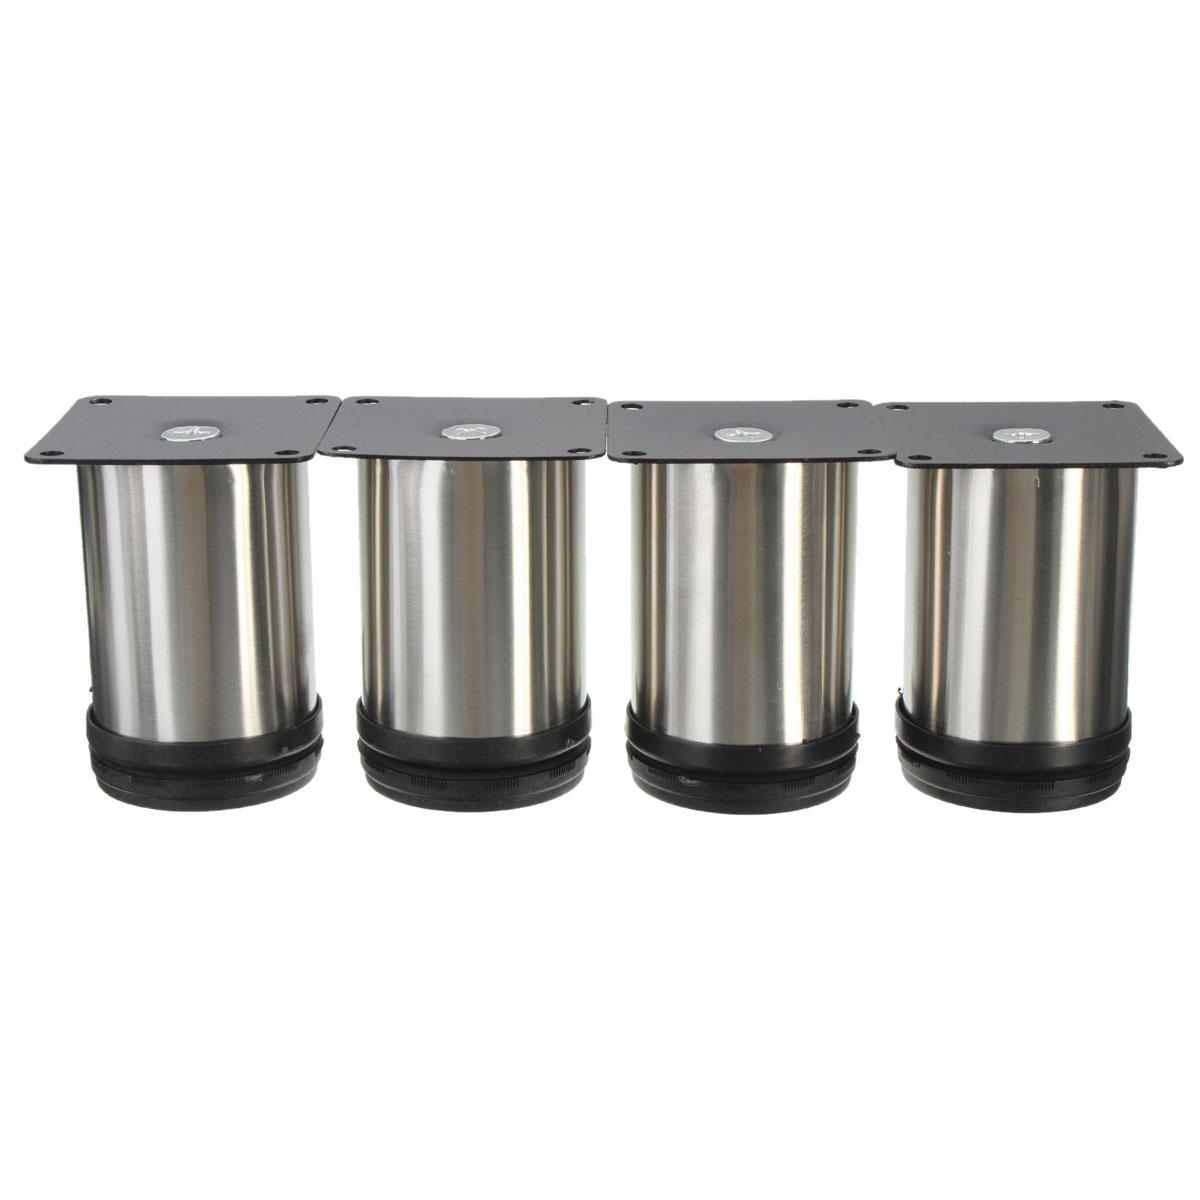 4pcs adjustable cabinet legs stainless steel kitchen feet